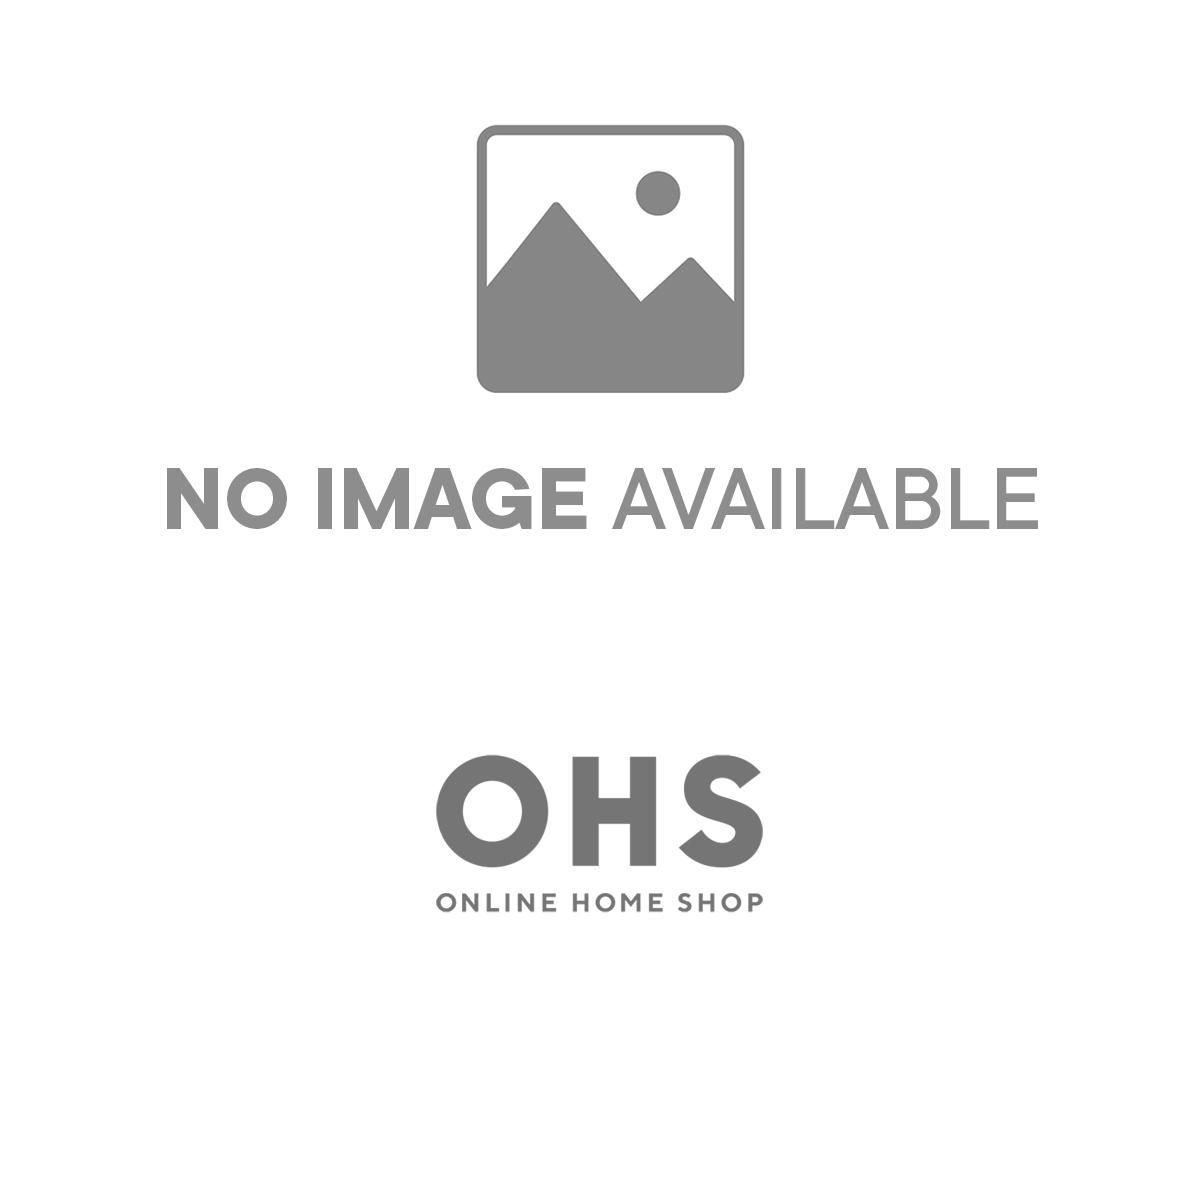 Sienna Faux Fur Super Soft Shaggy Rug - Charcoal